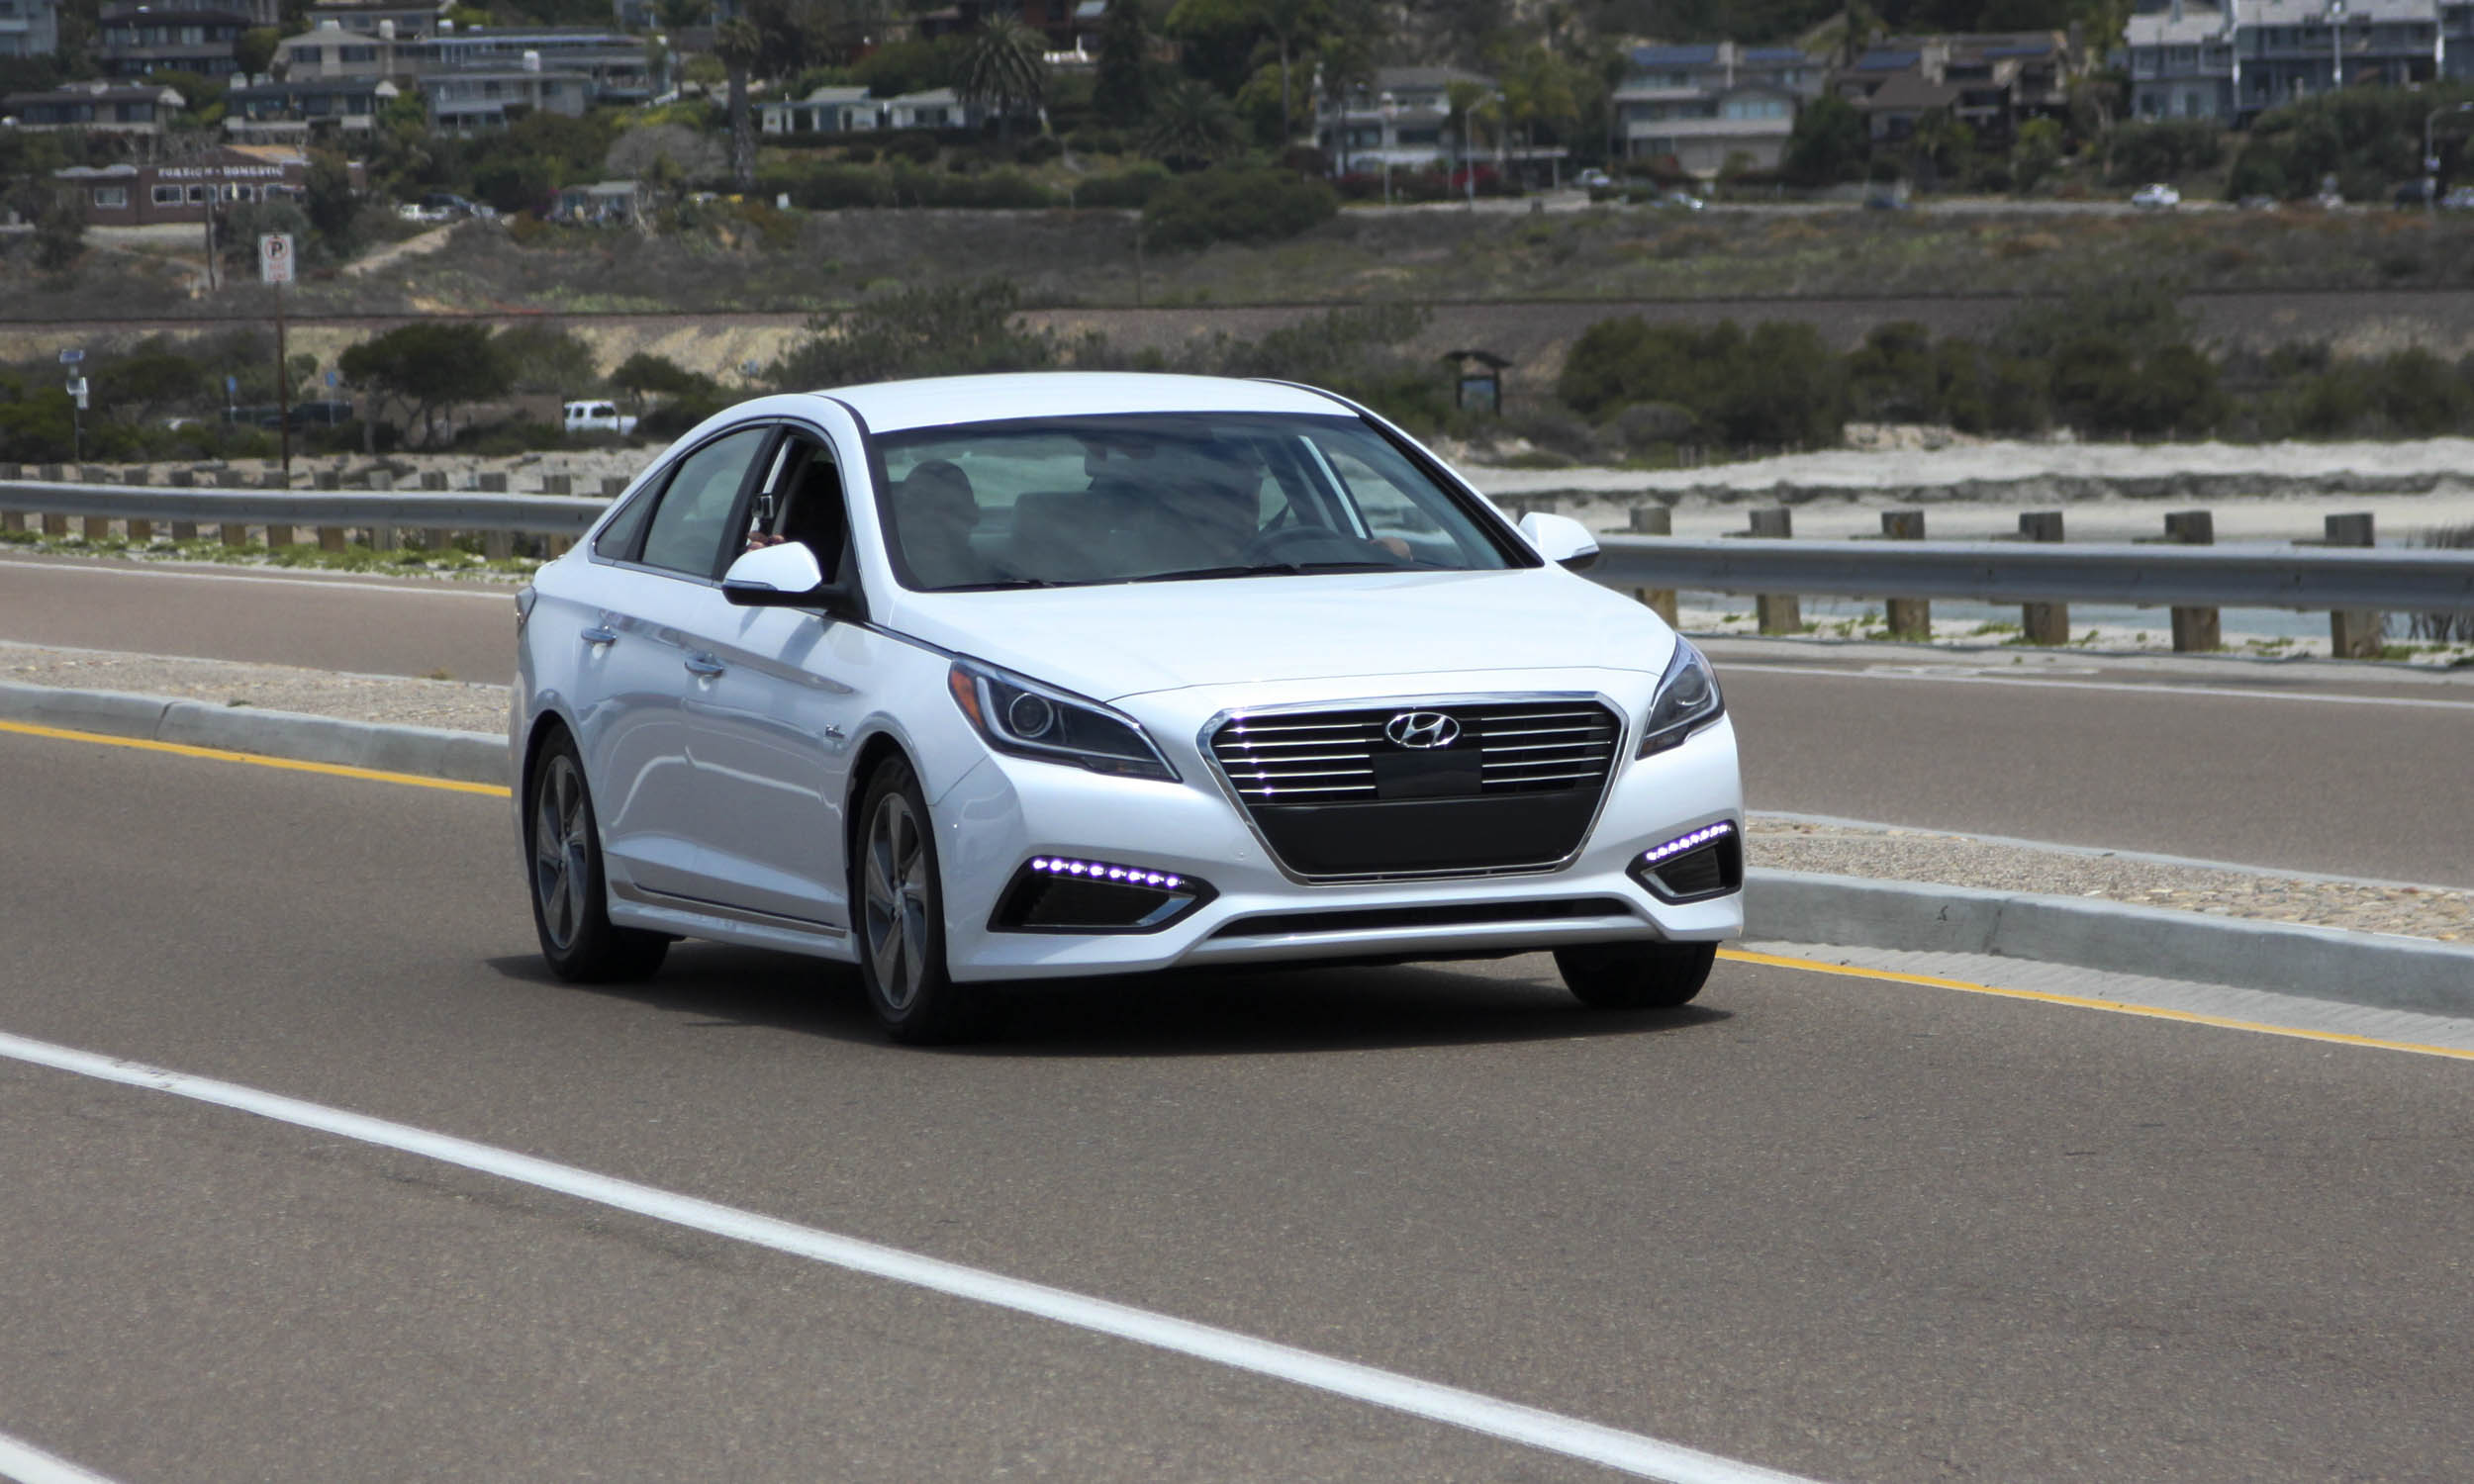 in drive auto expert rsf sonata our plug test hybrid hyundai